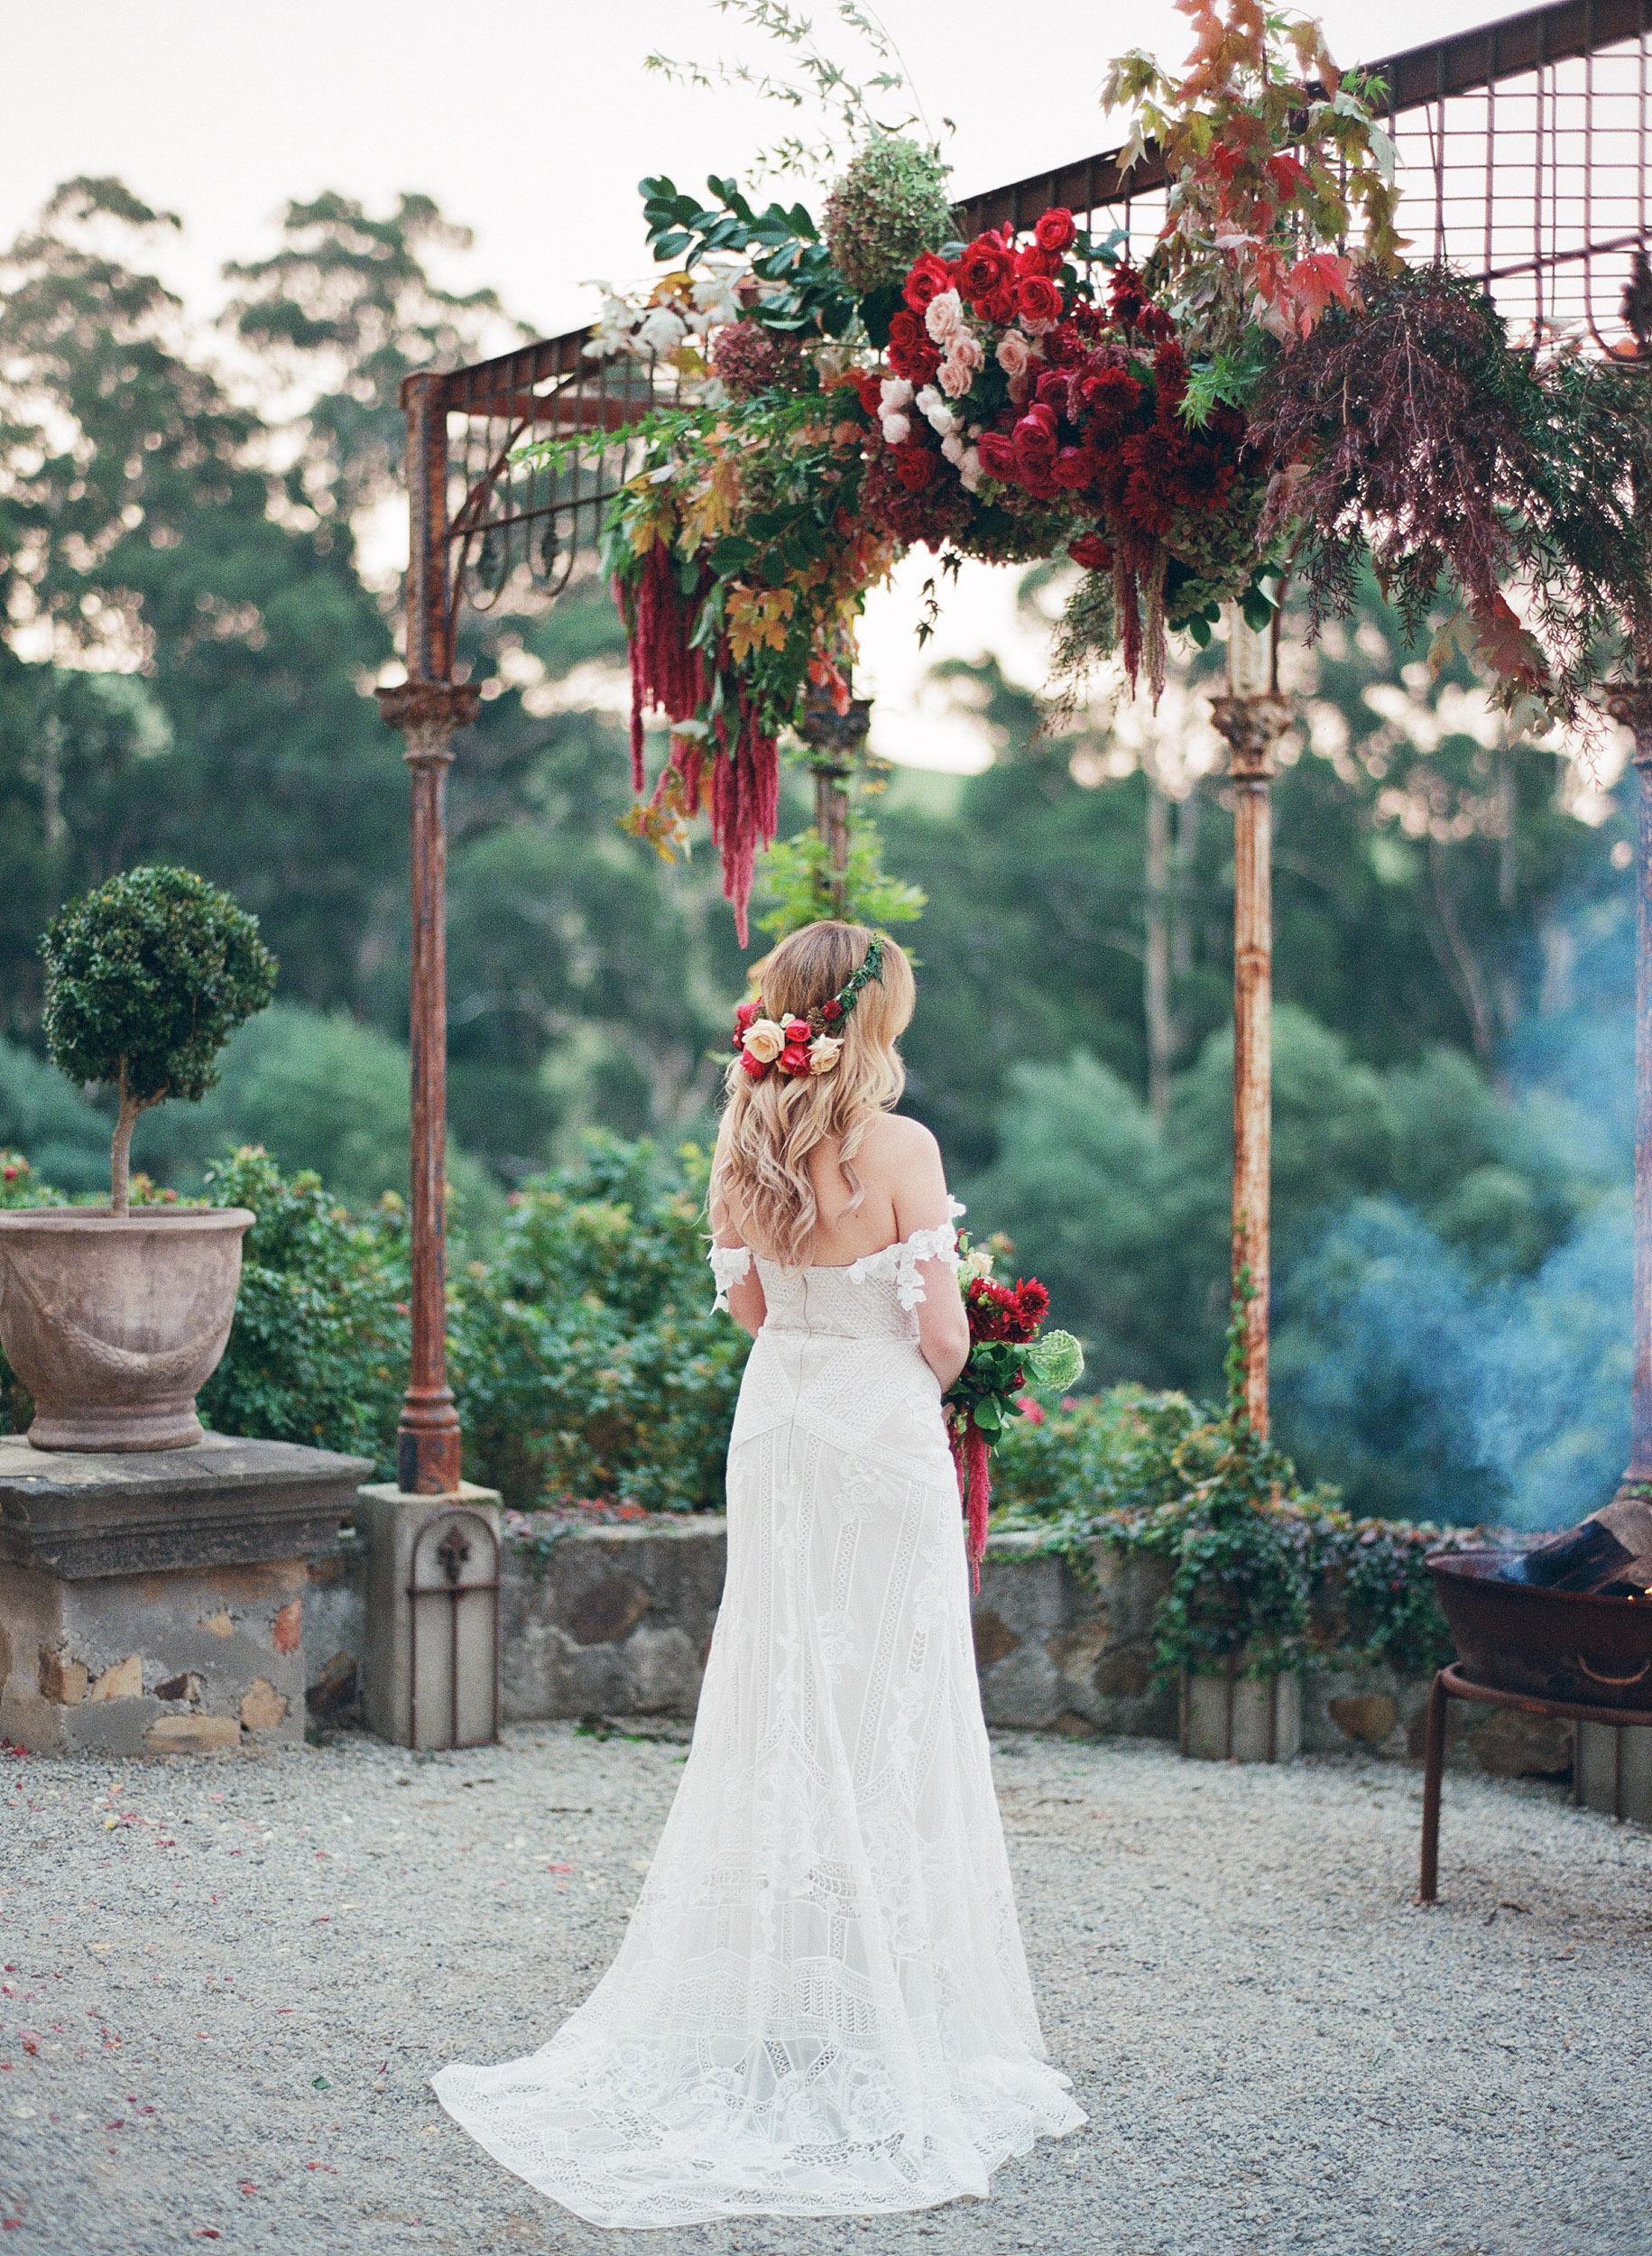 wedding (3 of 24) - 000032070011.jpg